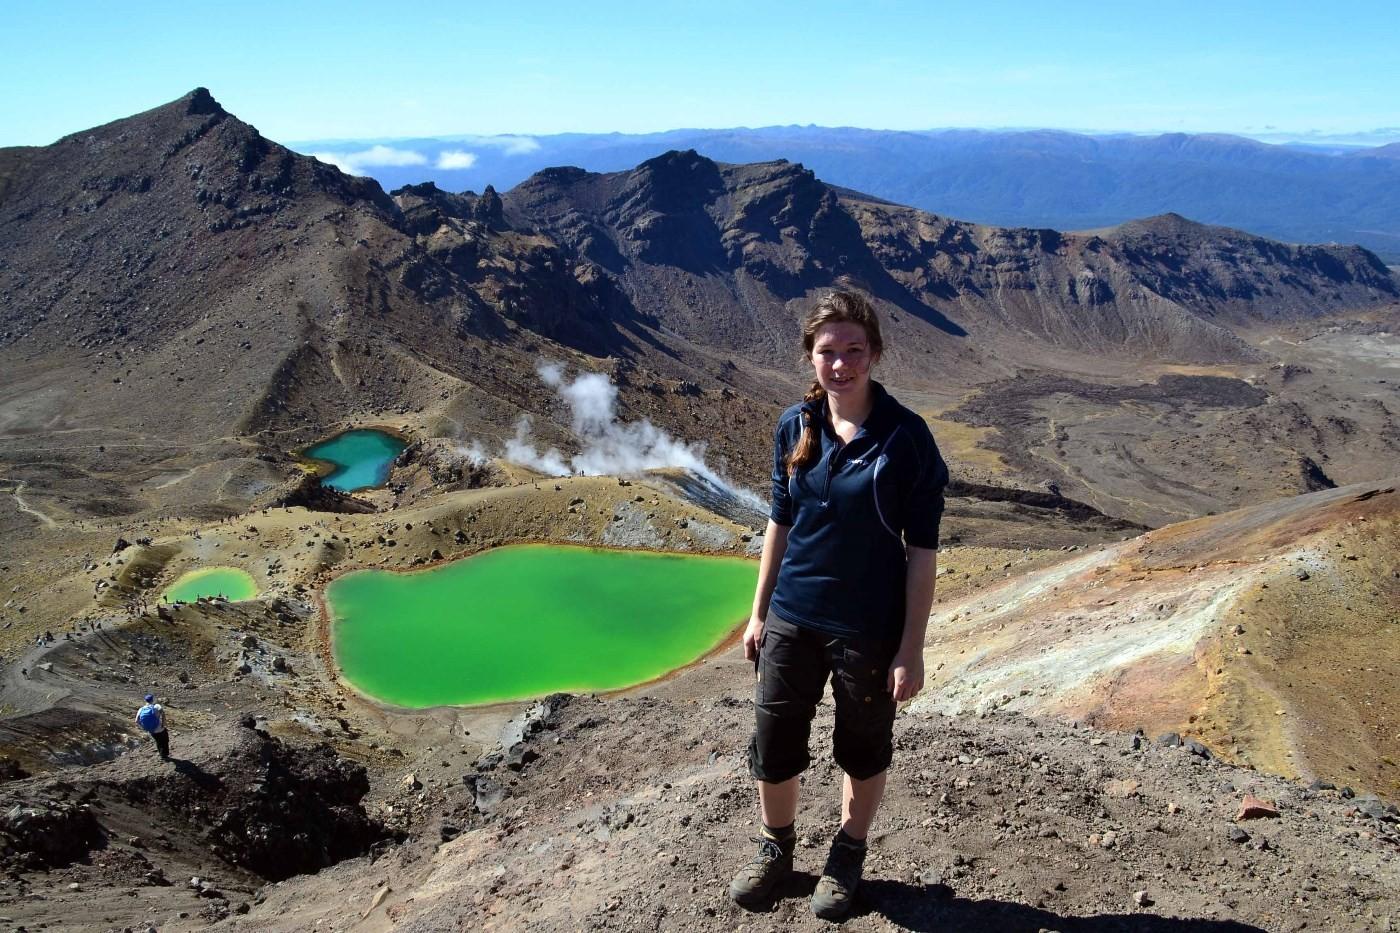 Oda framanfor Emerald Lakes i Tongariro. Foto: Driva/Oda Halle